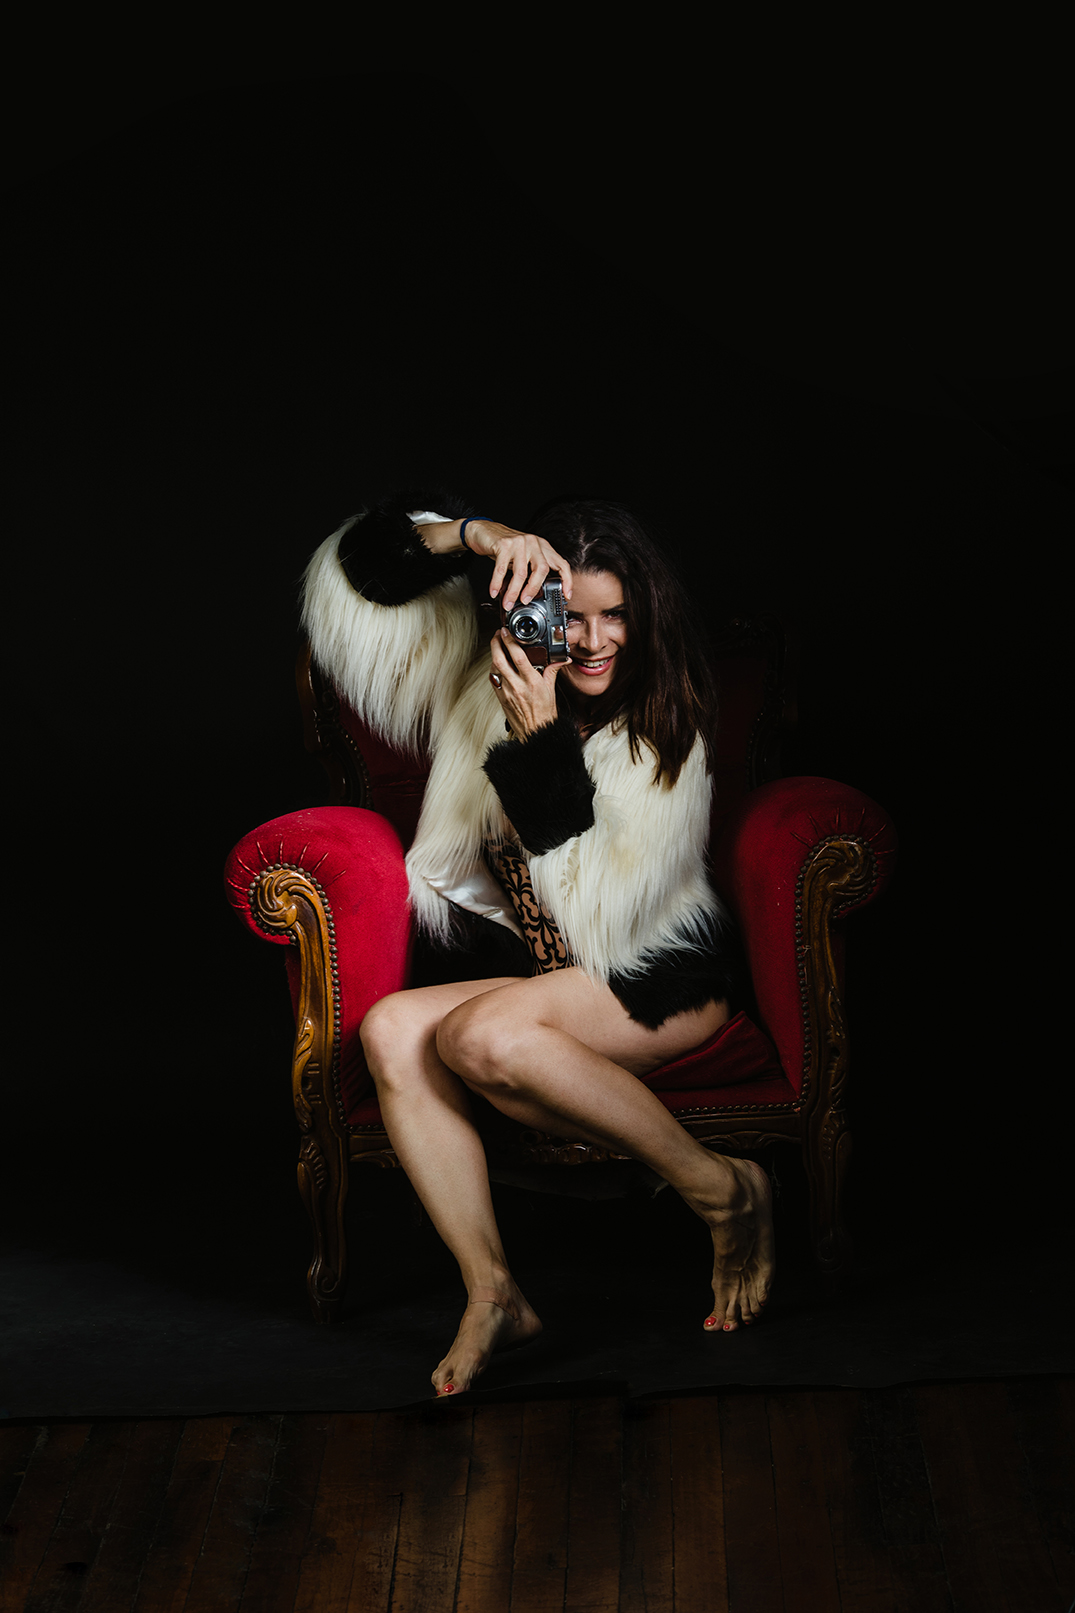 Lioness-photographer-Nikki-Mclennan